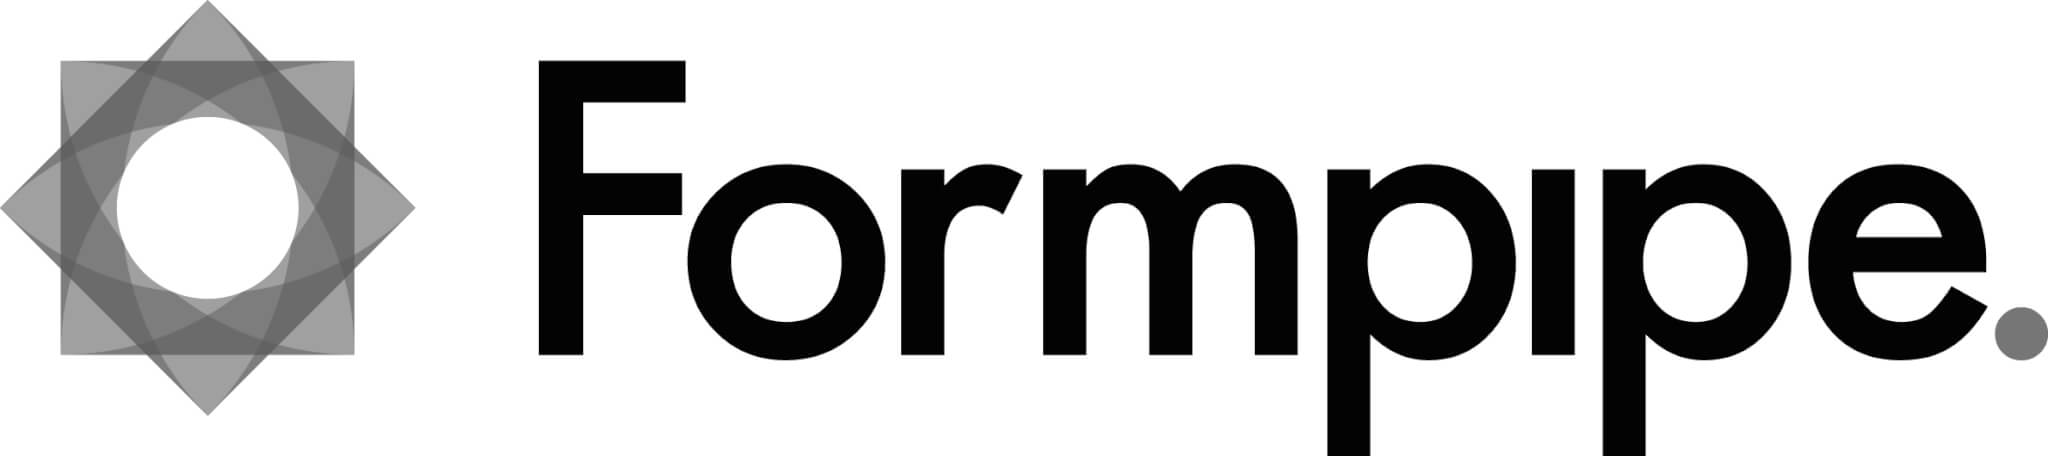 Formpipe logo